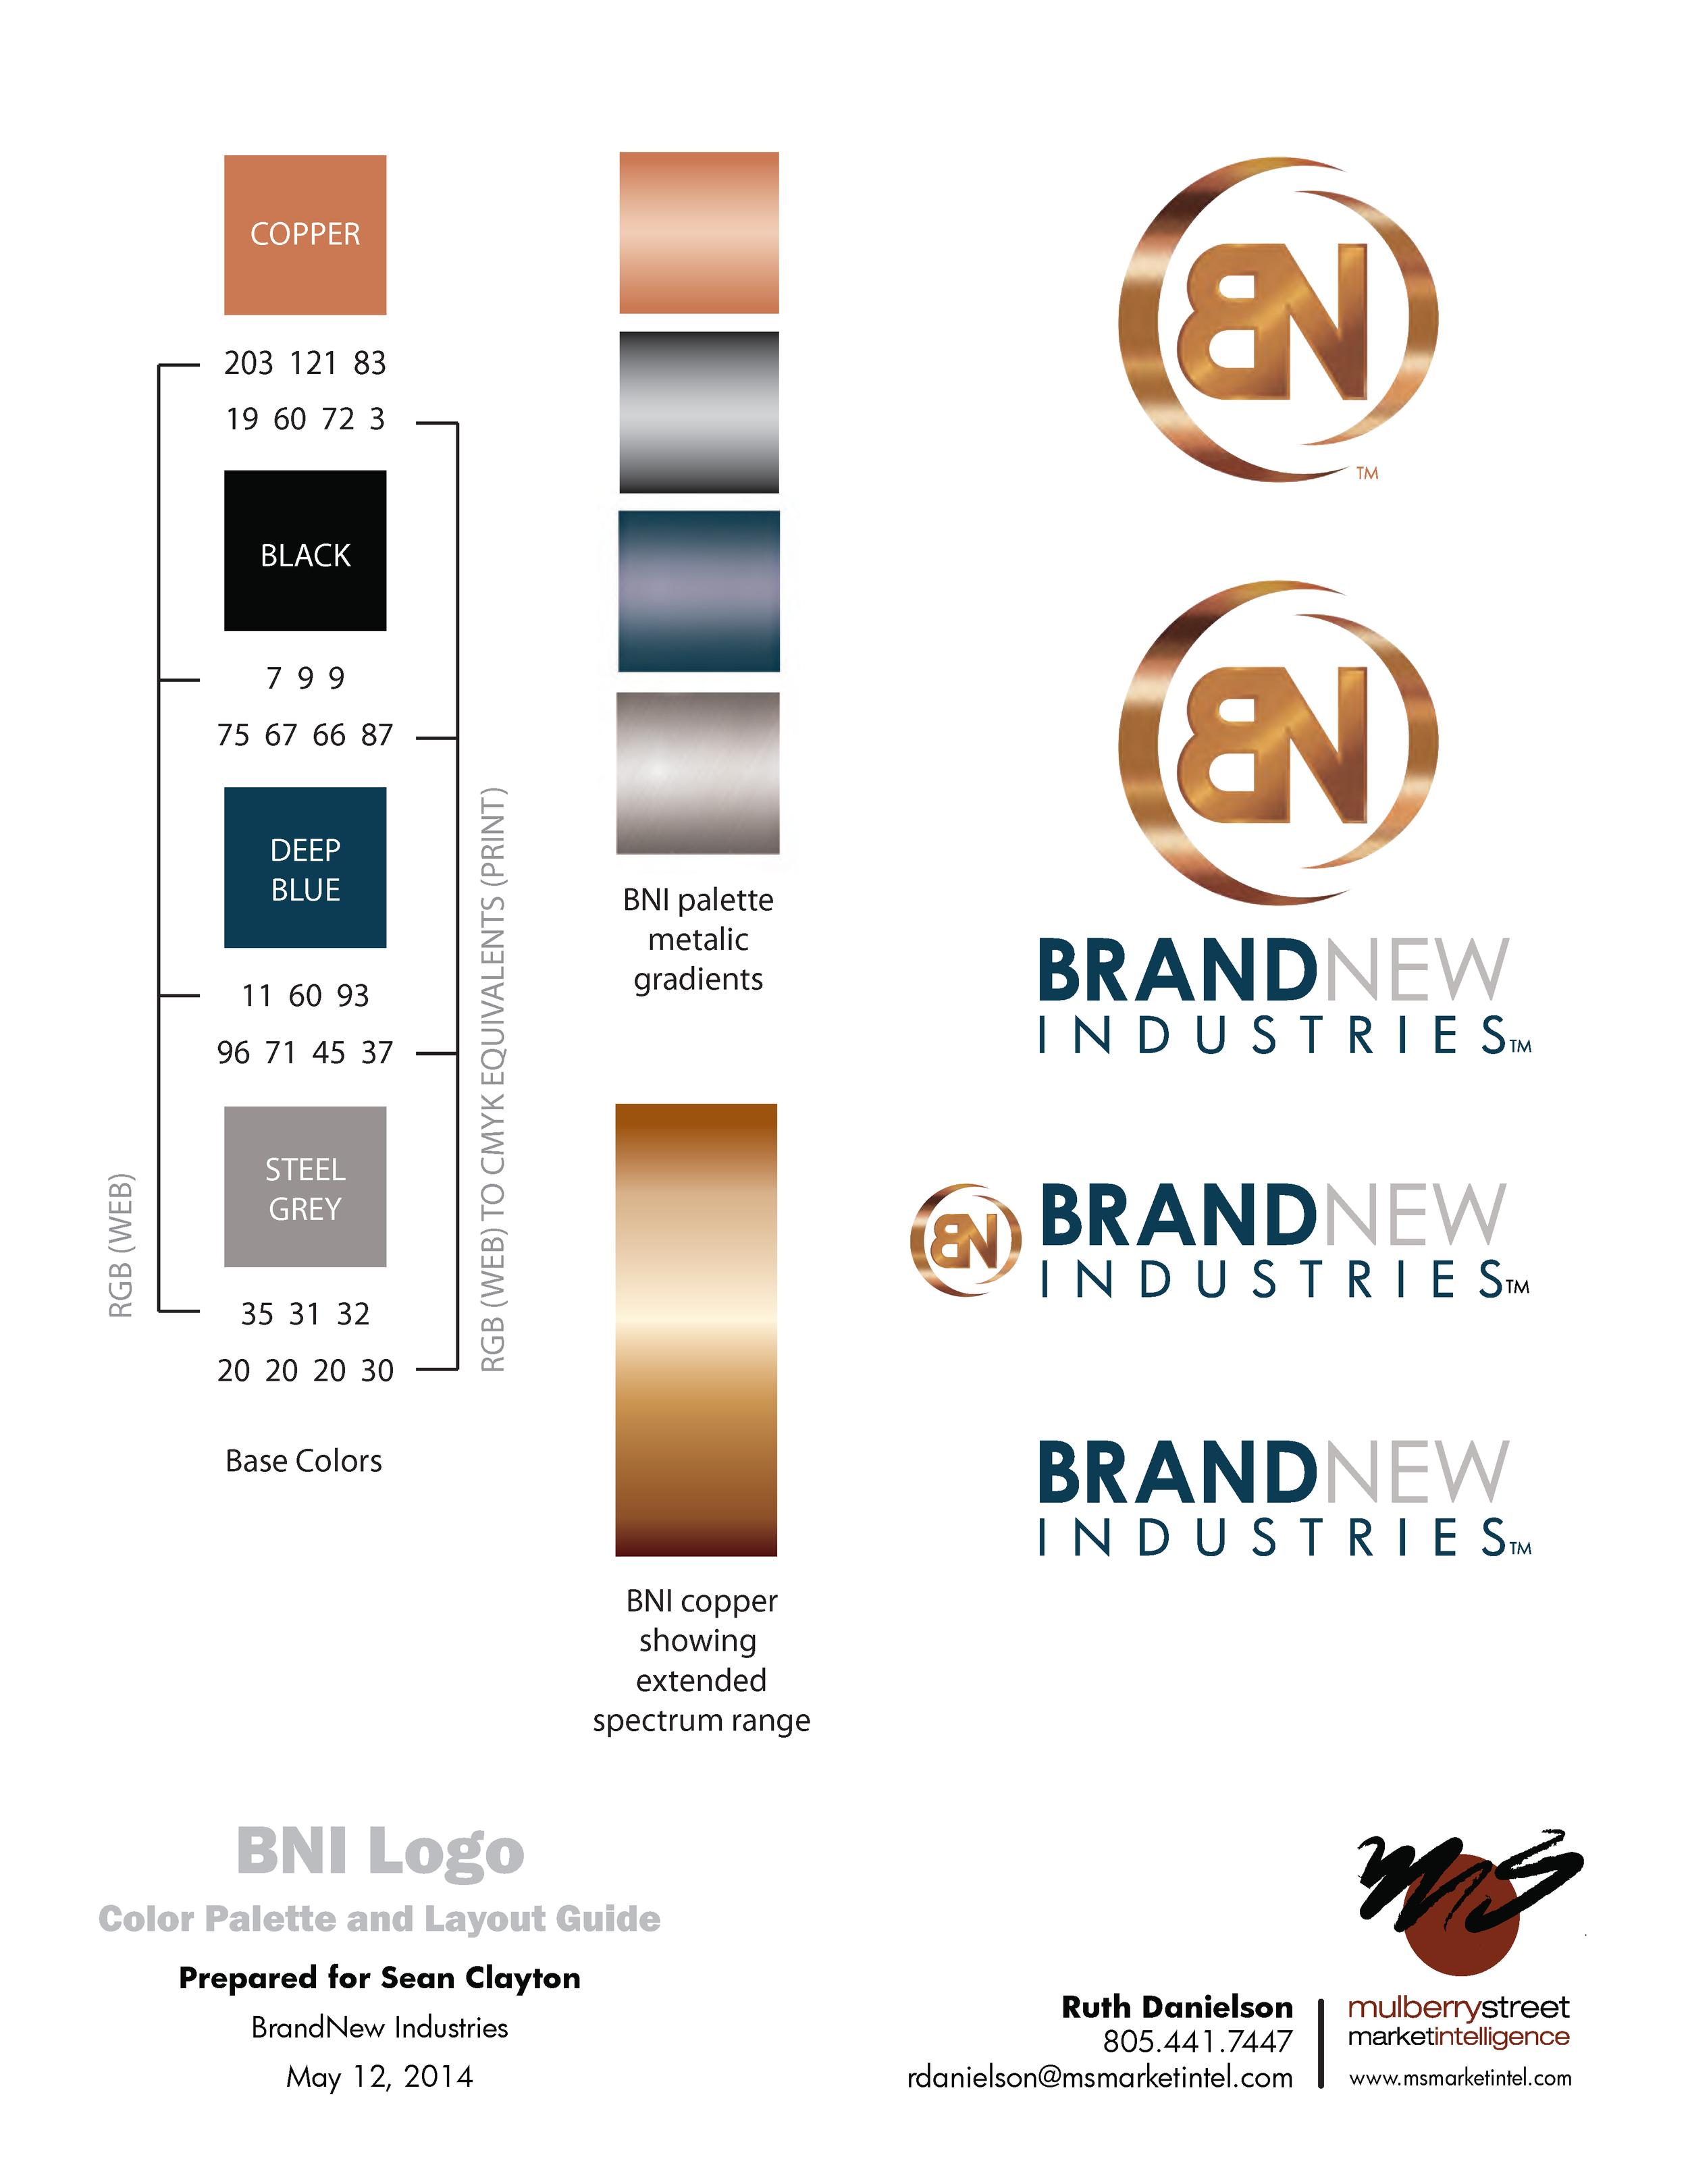 msmi-bni-color-palette